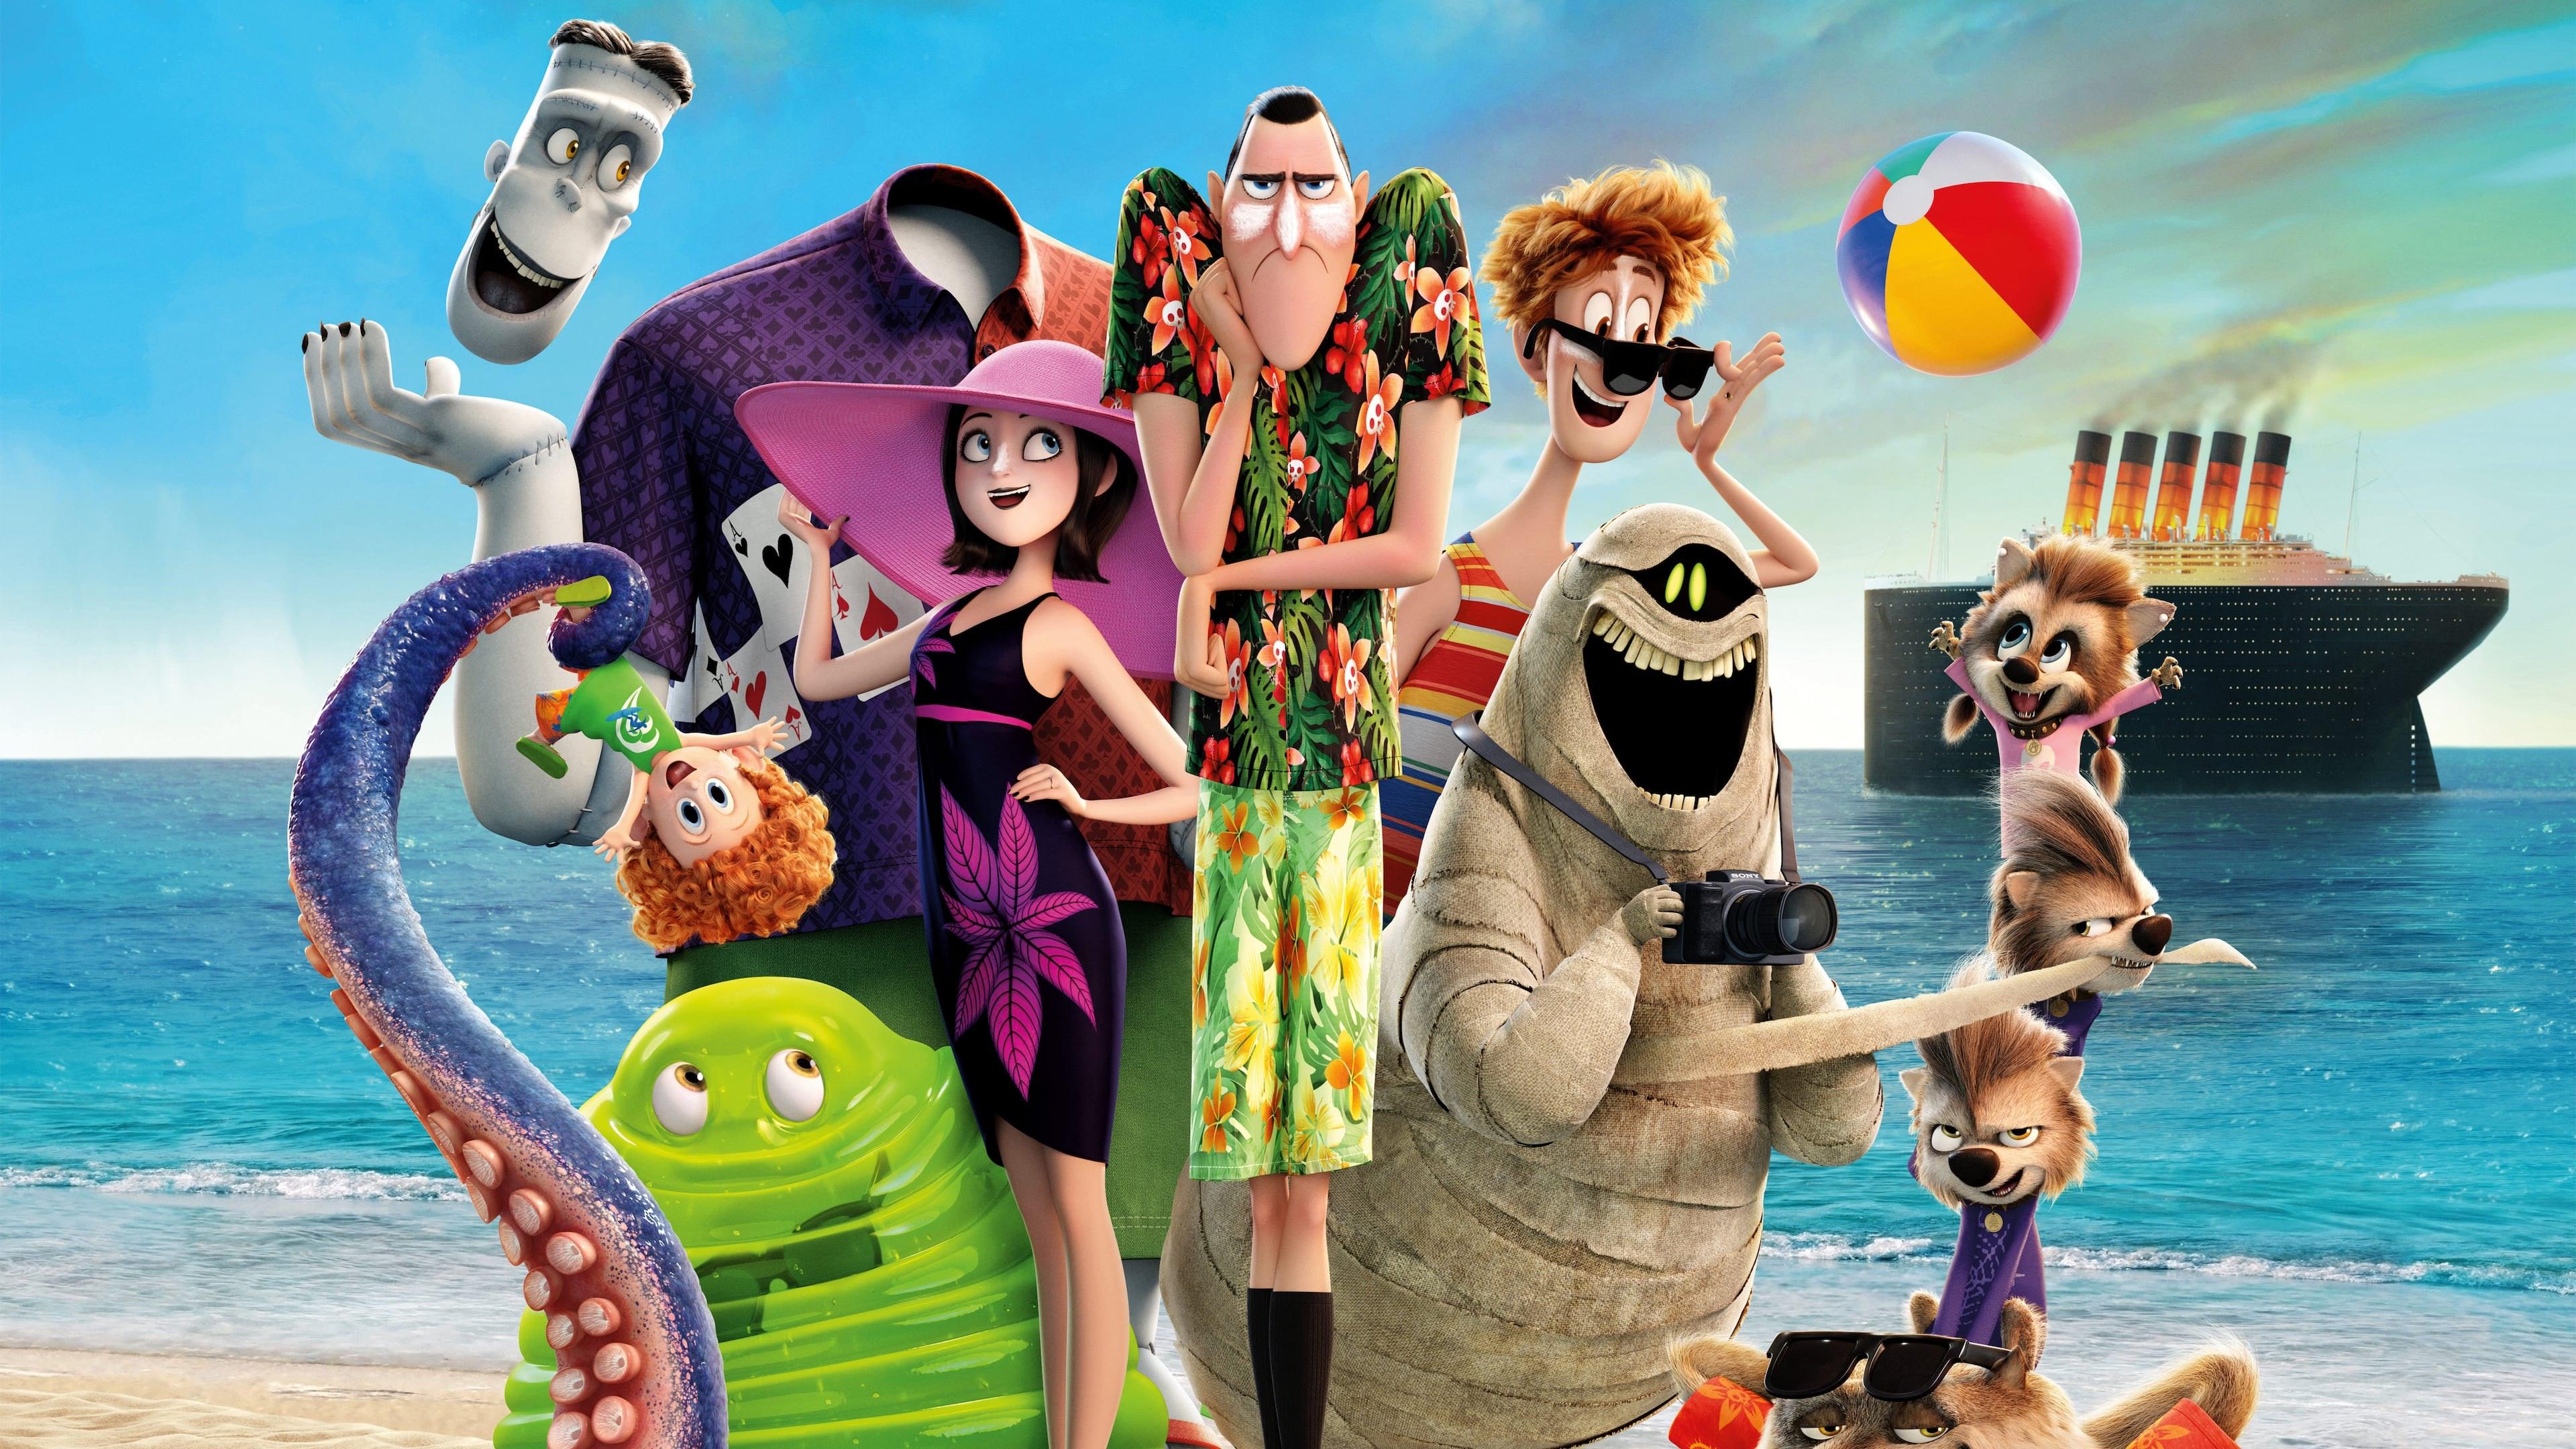 Hotel Transylvania 3: Summer Vacation Soundtrack